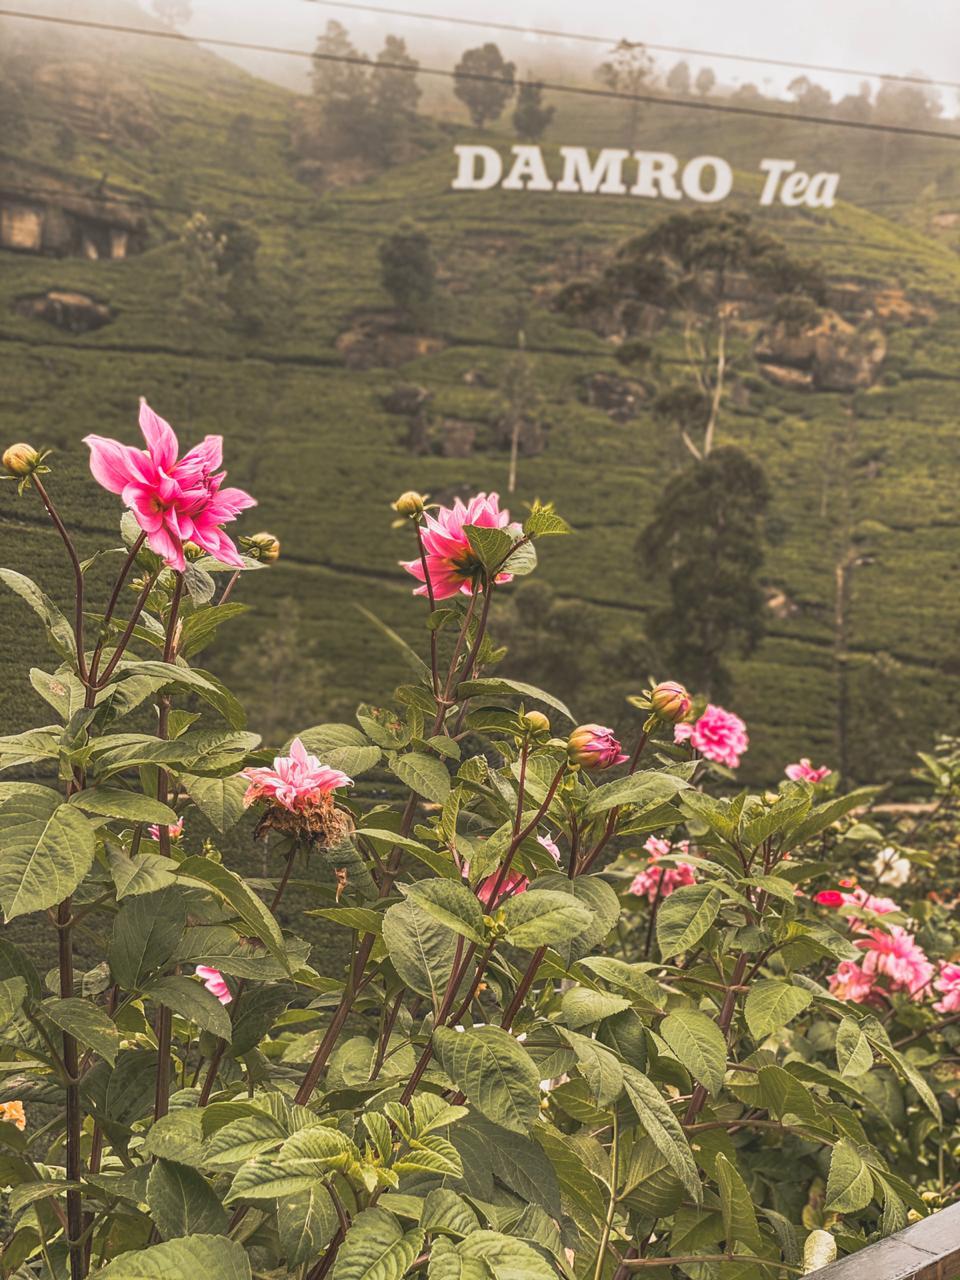 Damro Tea